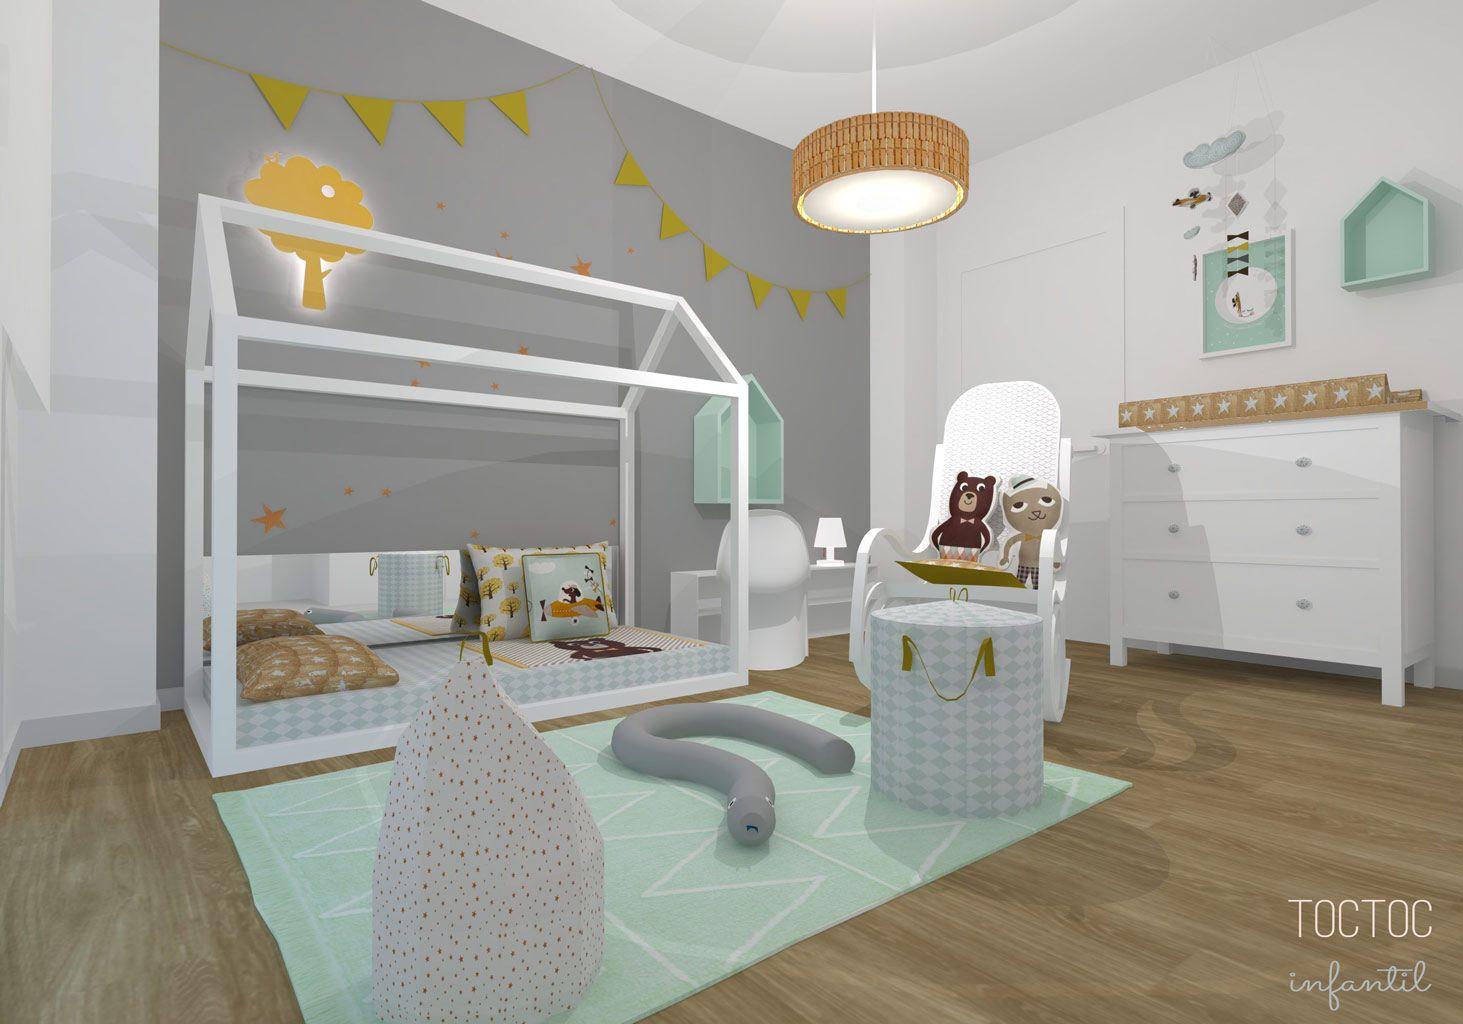 Montessori mint y mostaza toc toc infantil http www for Cuarto xl mostaza